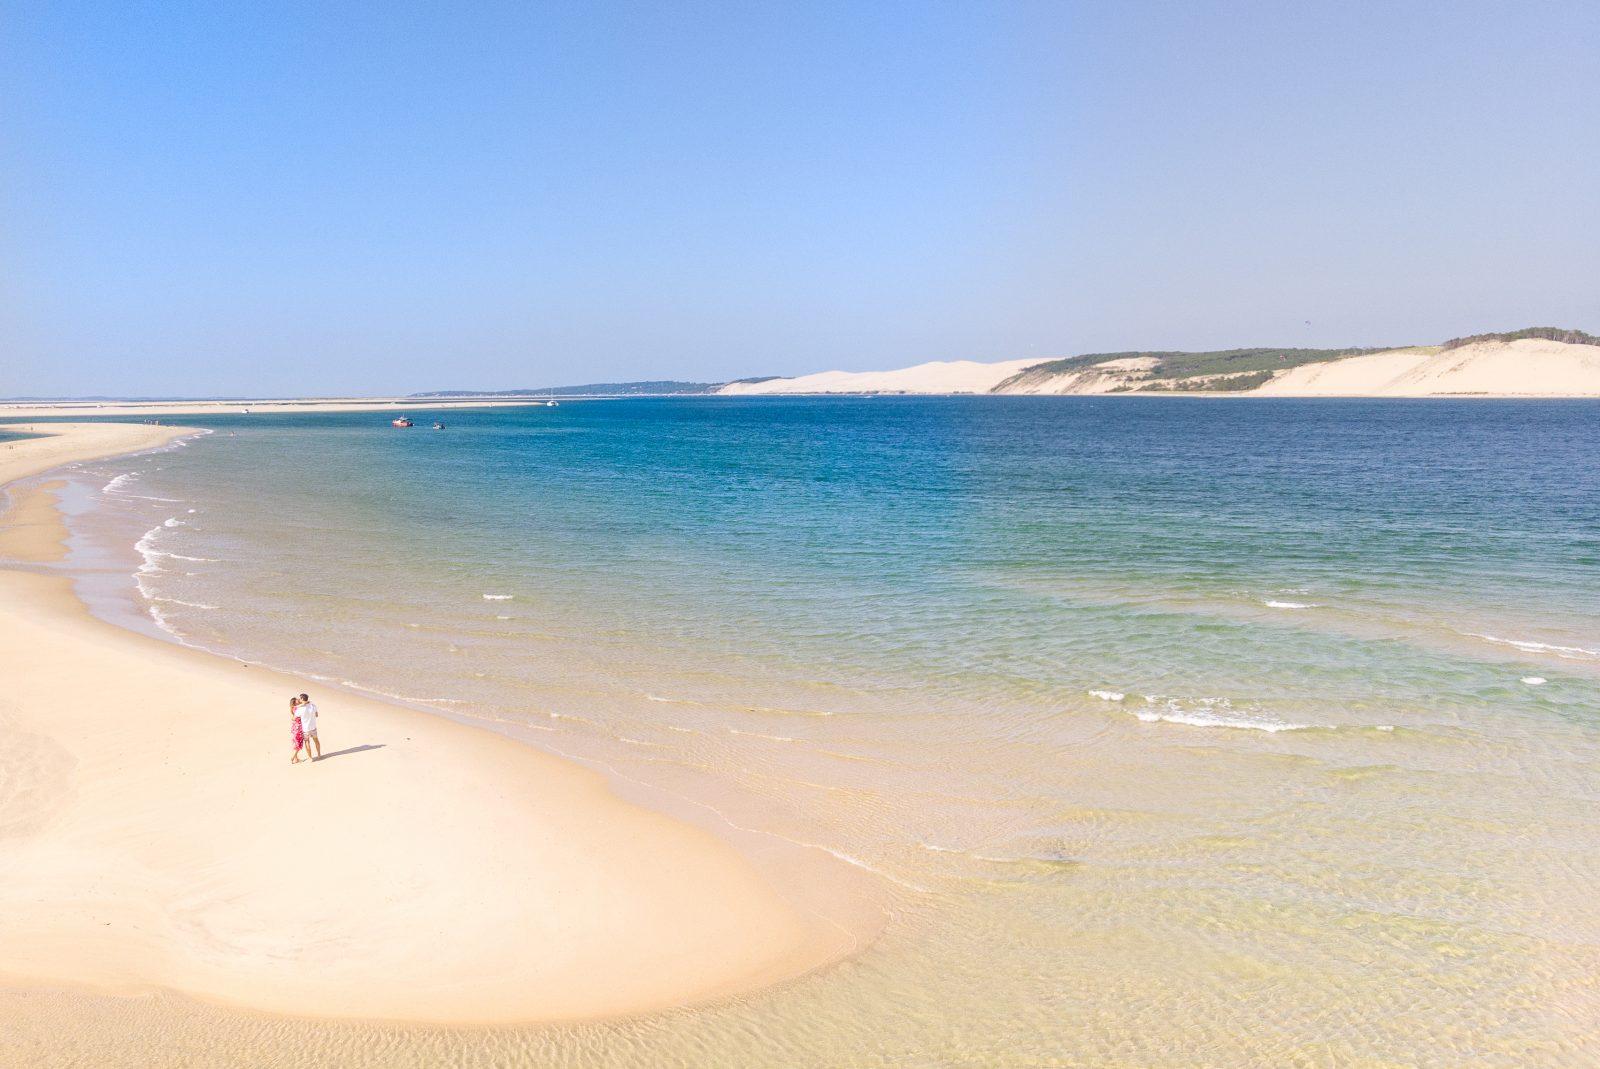 Dune pyla 3 - FMR TravelBlog